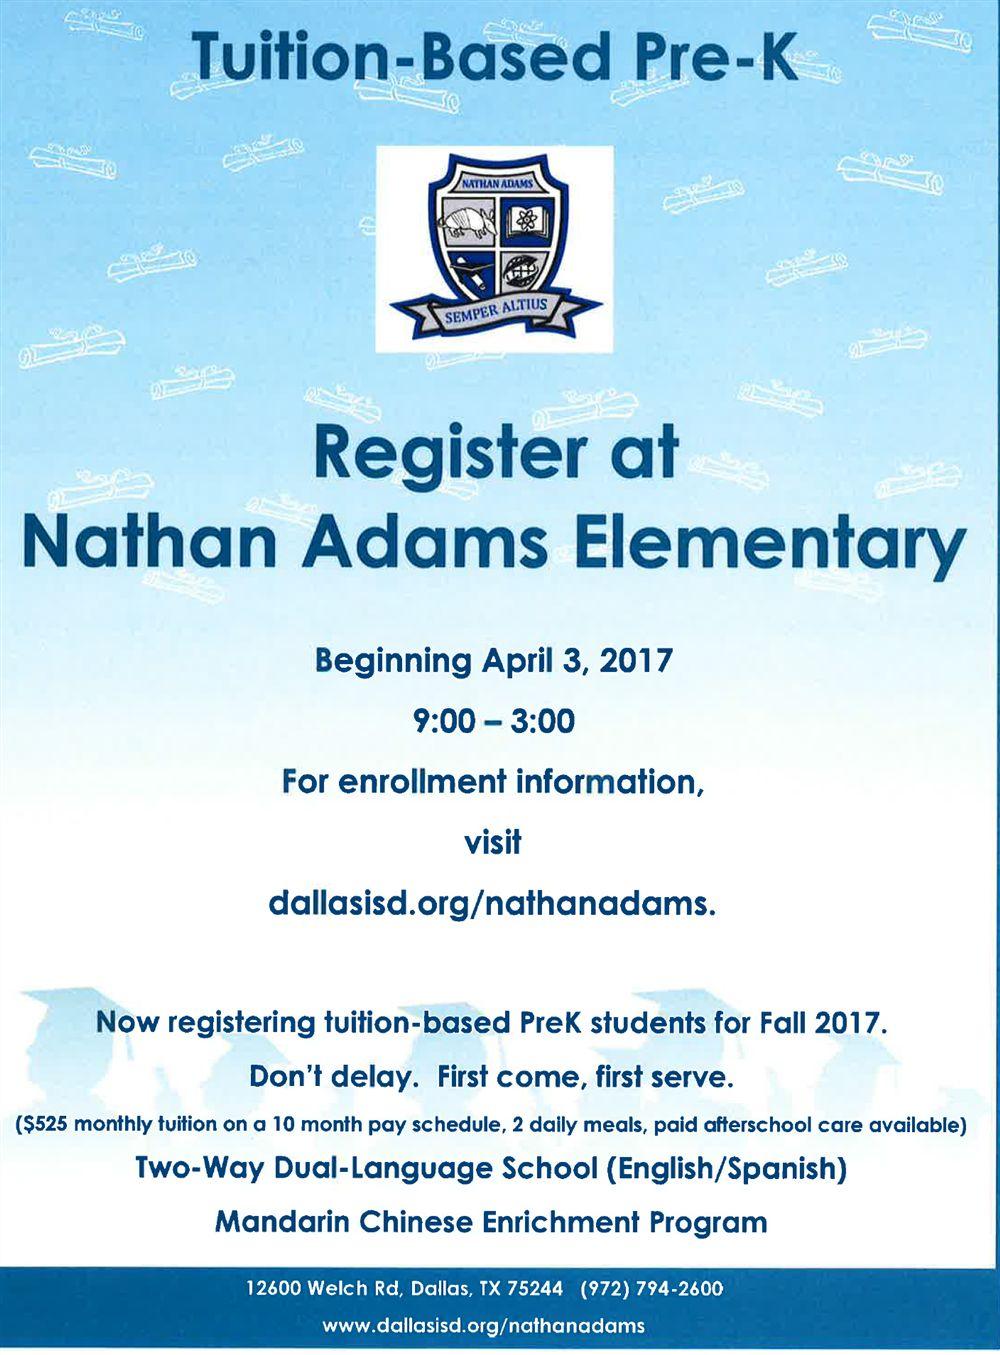 Nathan Adams Elementary School / Nathan Adams Elementary School